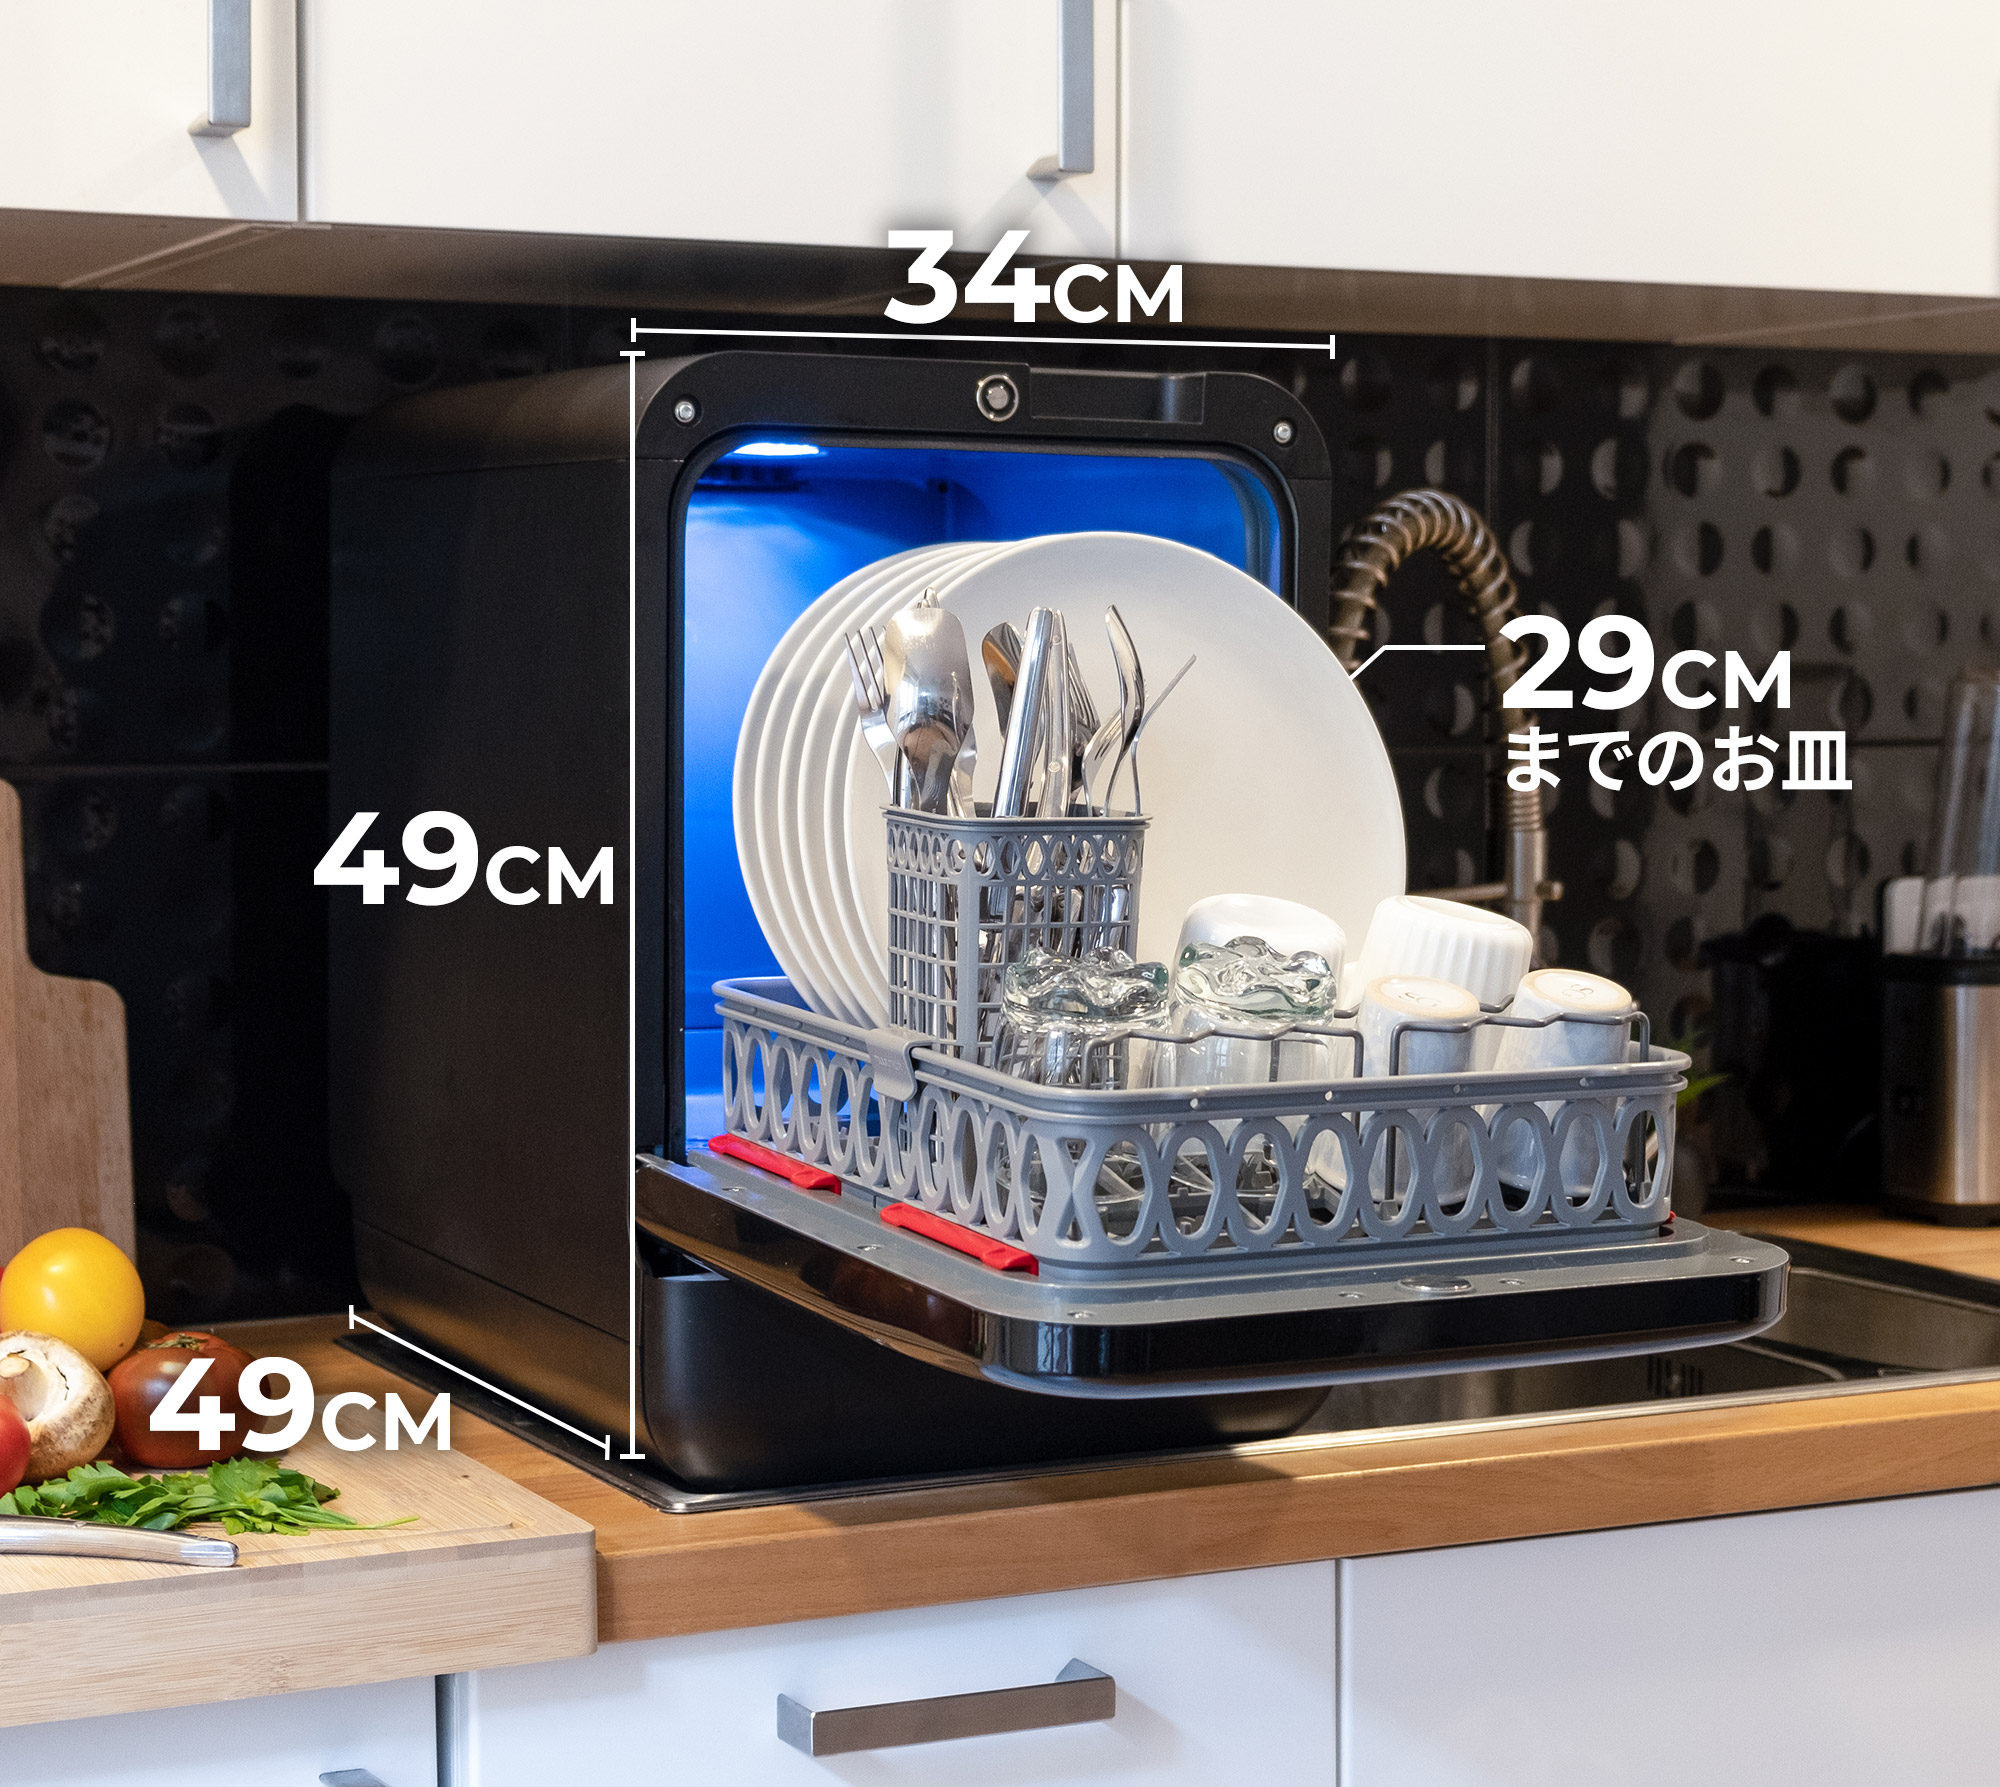 Dimensions size Bob mini dishwasher